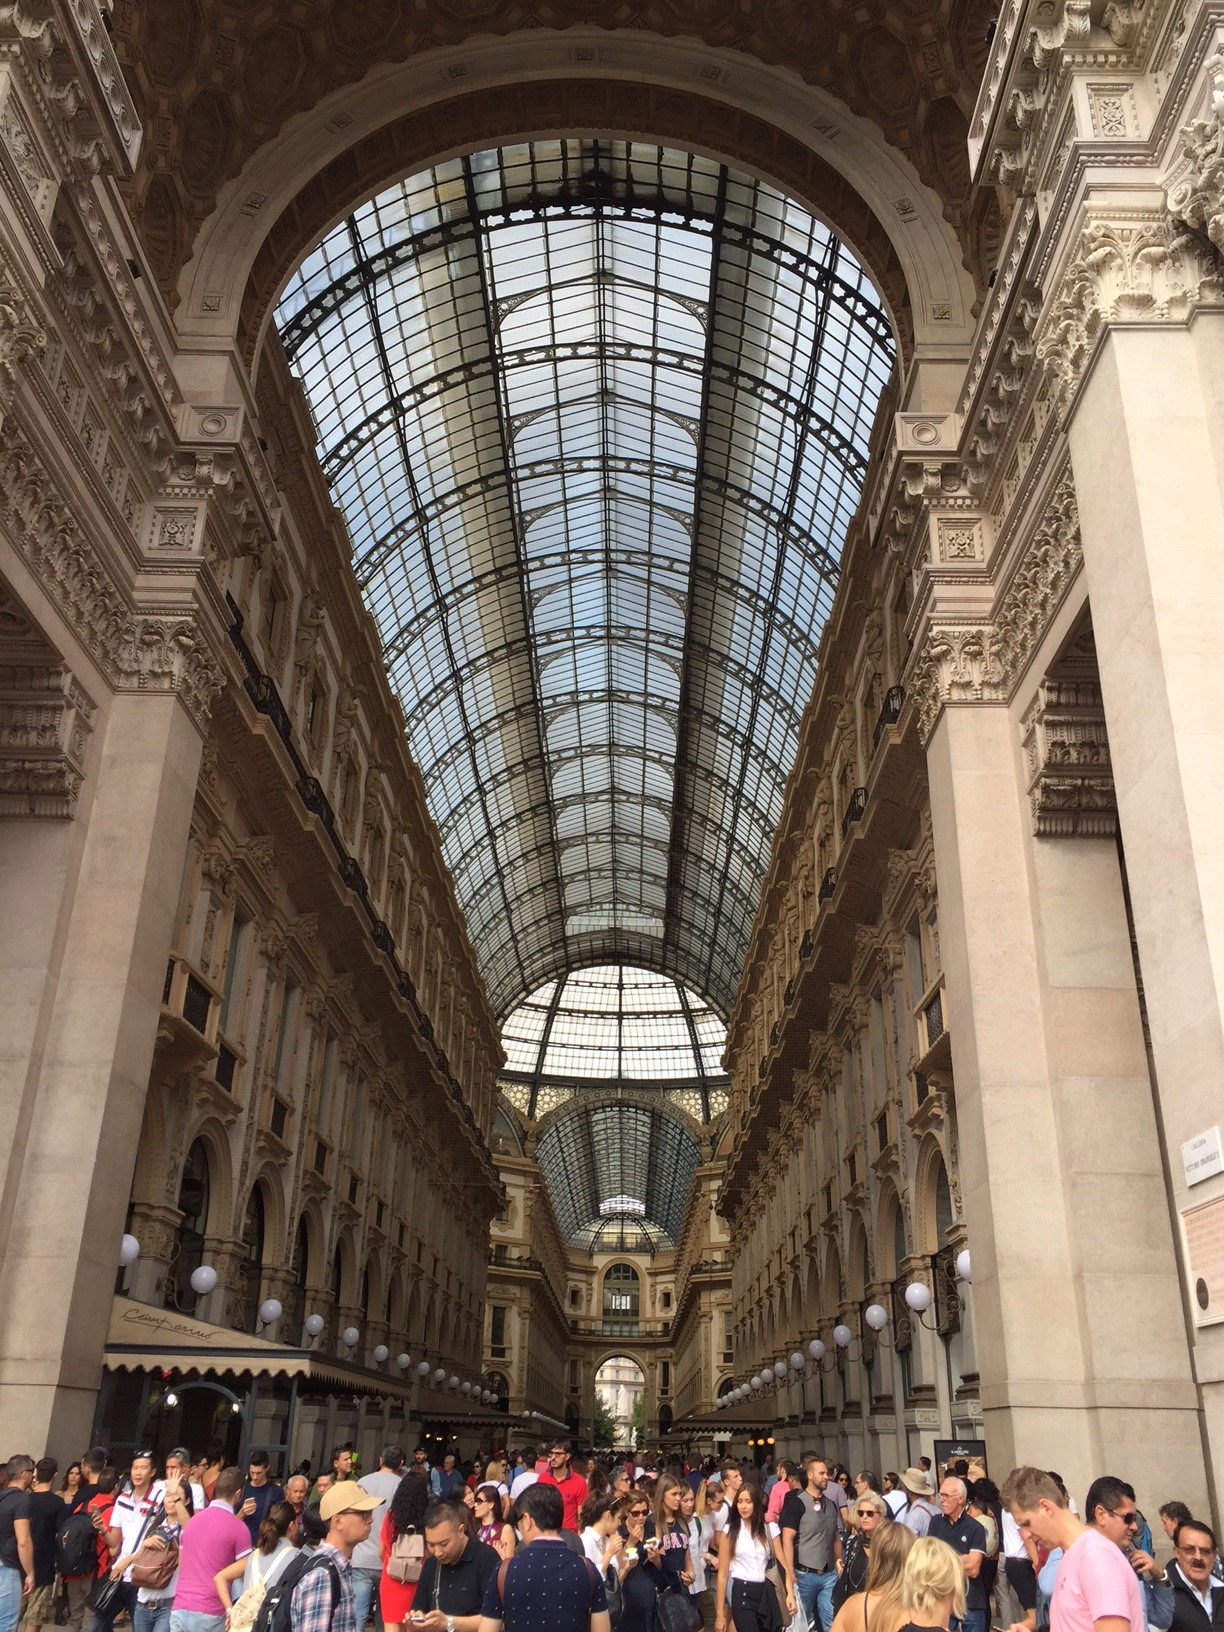 Galleria hall